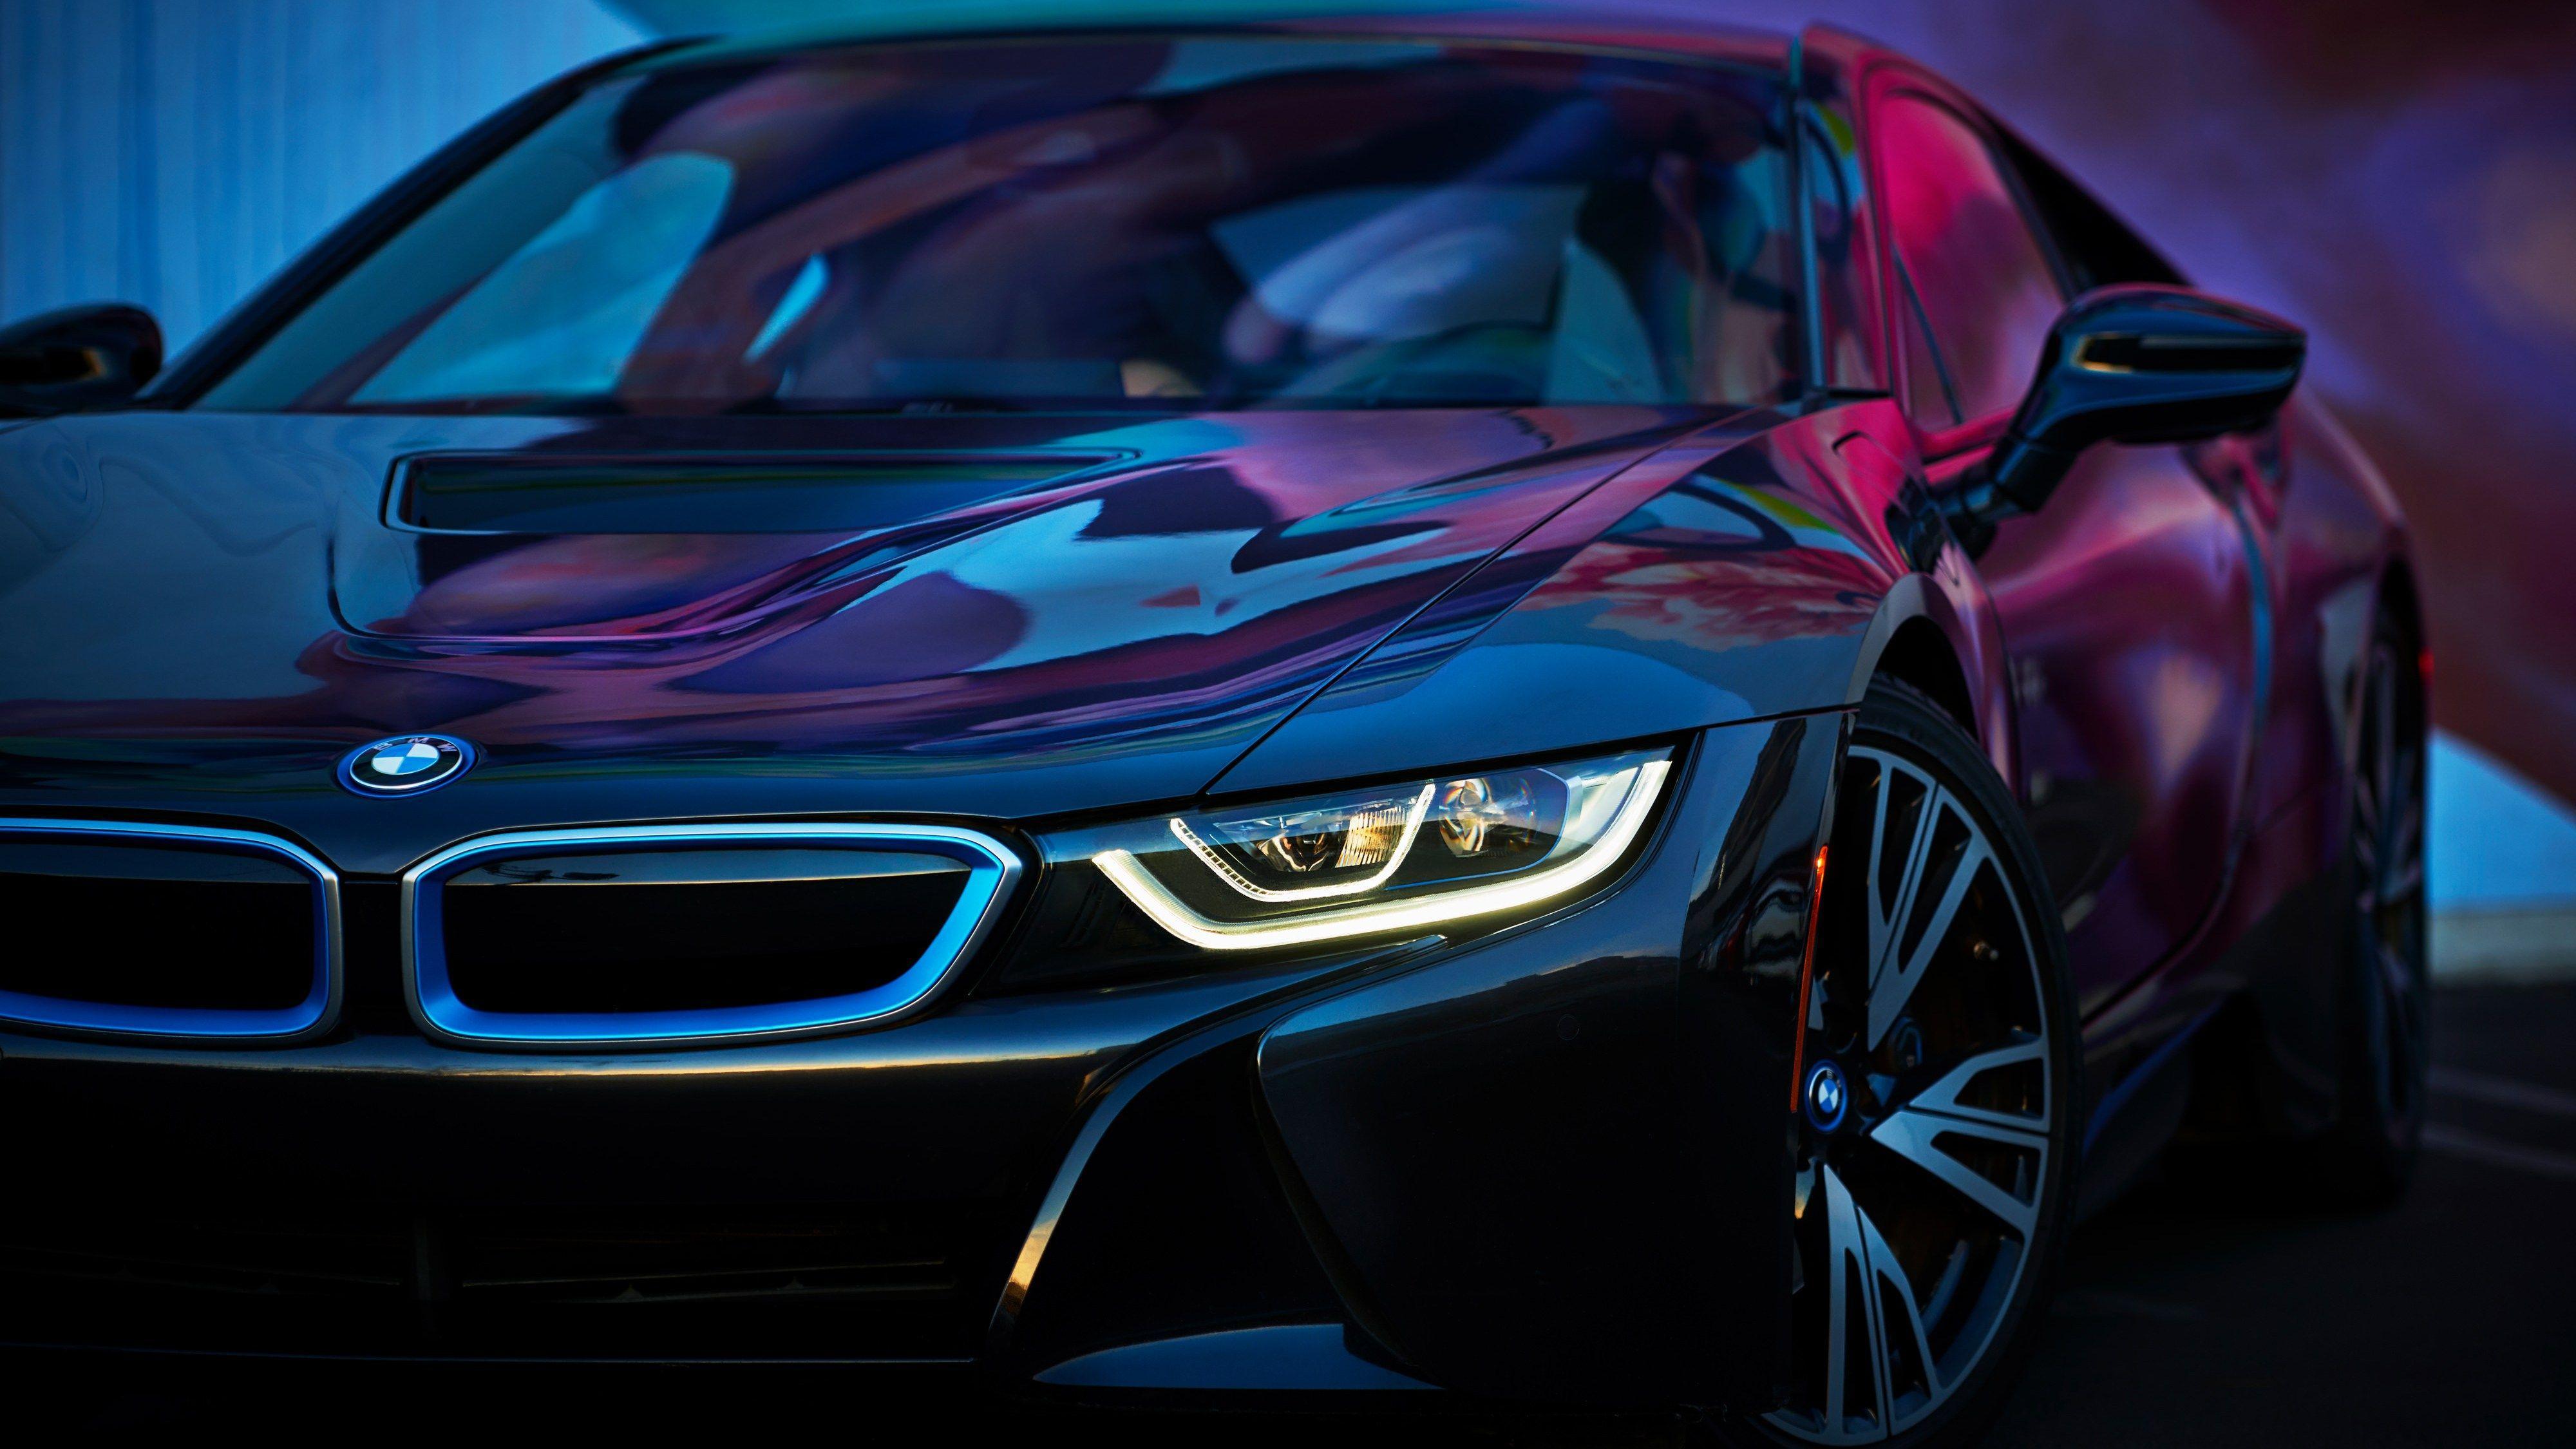 4k Laptop Car Wallpapers Top Free 4k Laptop Car Backgrounds